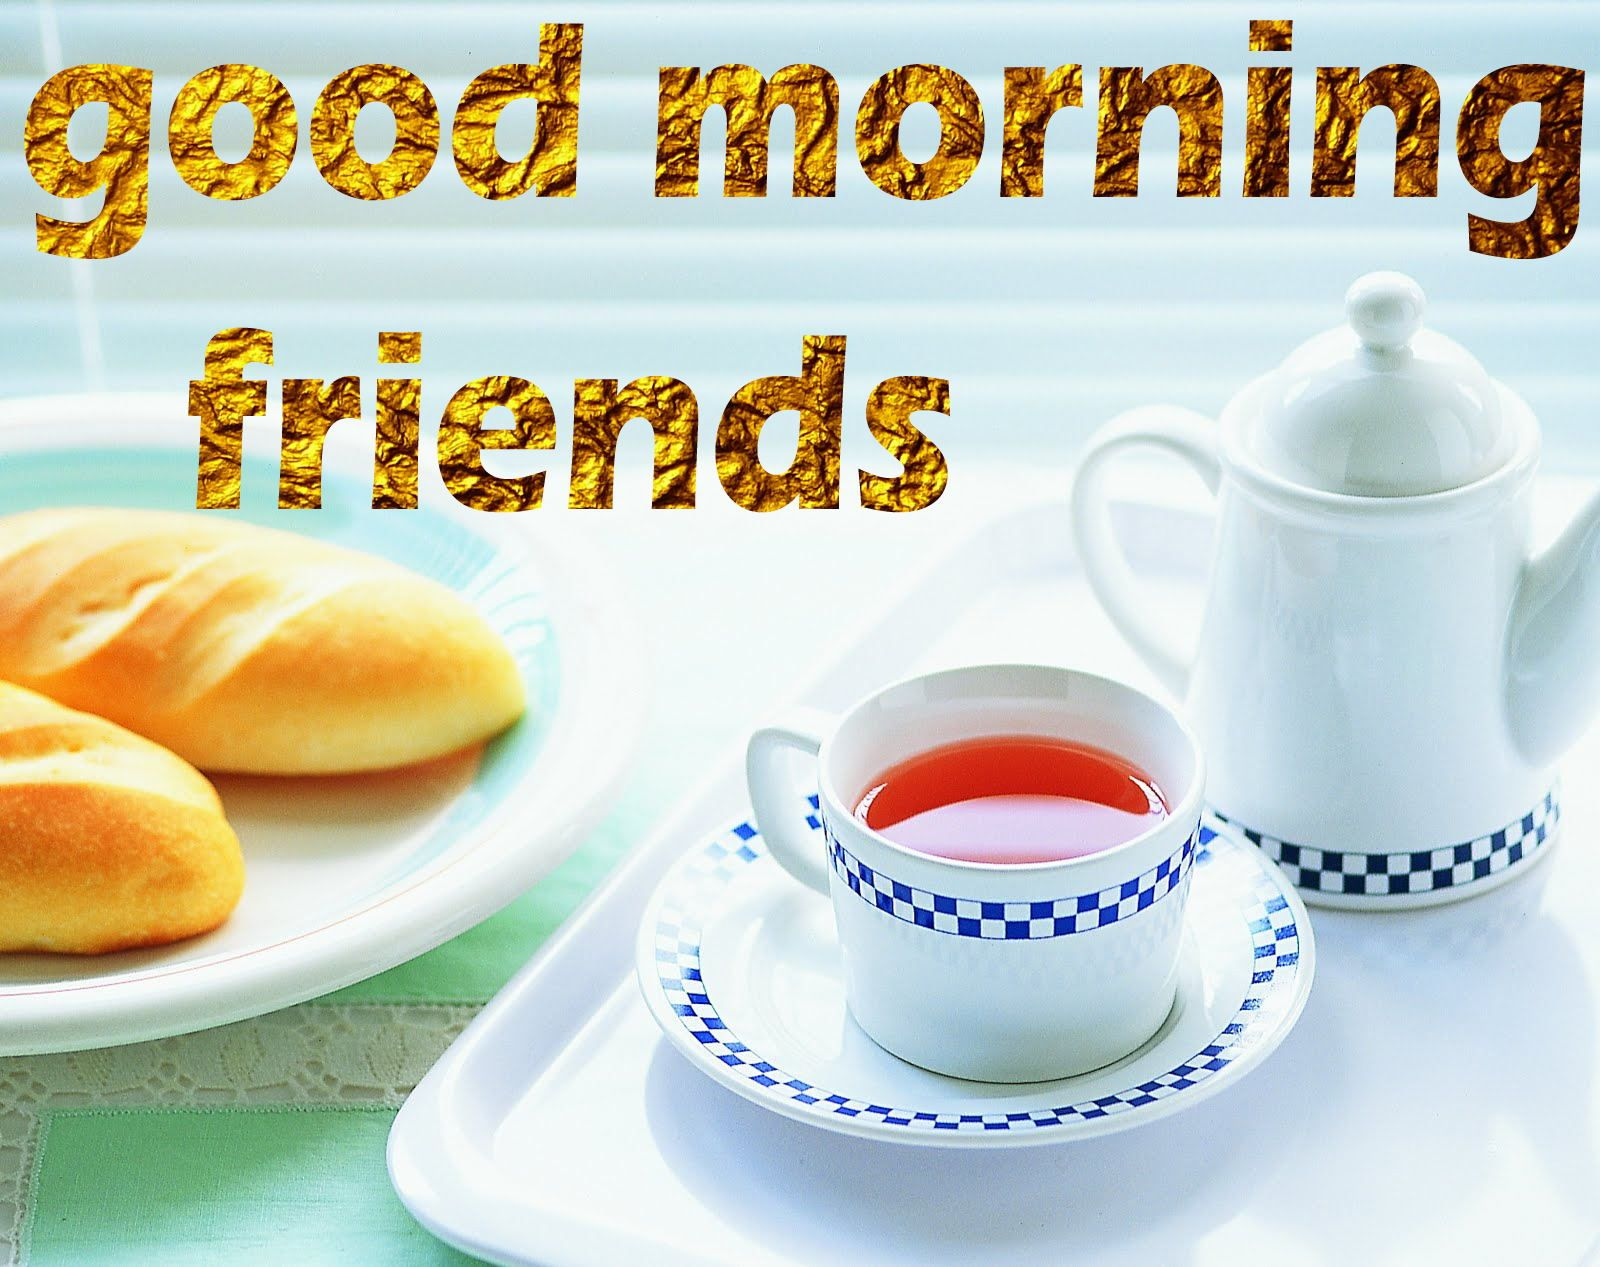 Hd wallpaper of good morning - Good Morning Images Pictures Good Morning Hd Wallpapers Cover Pics For Facebook Whatsapp Conversations